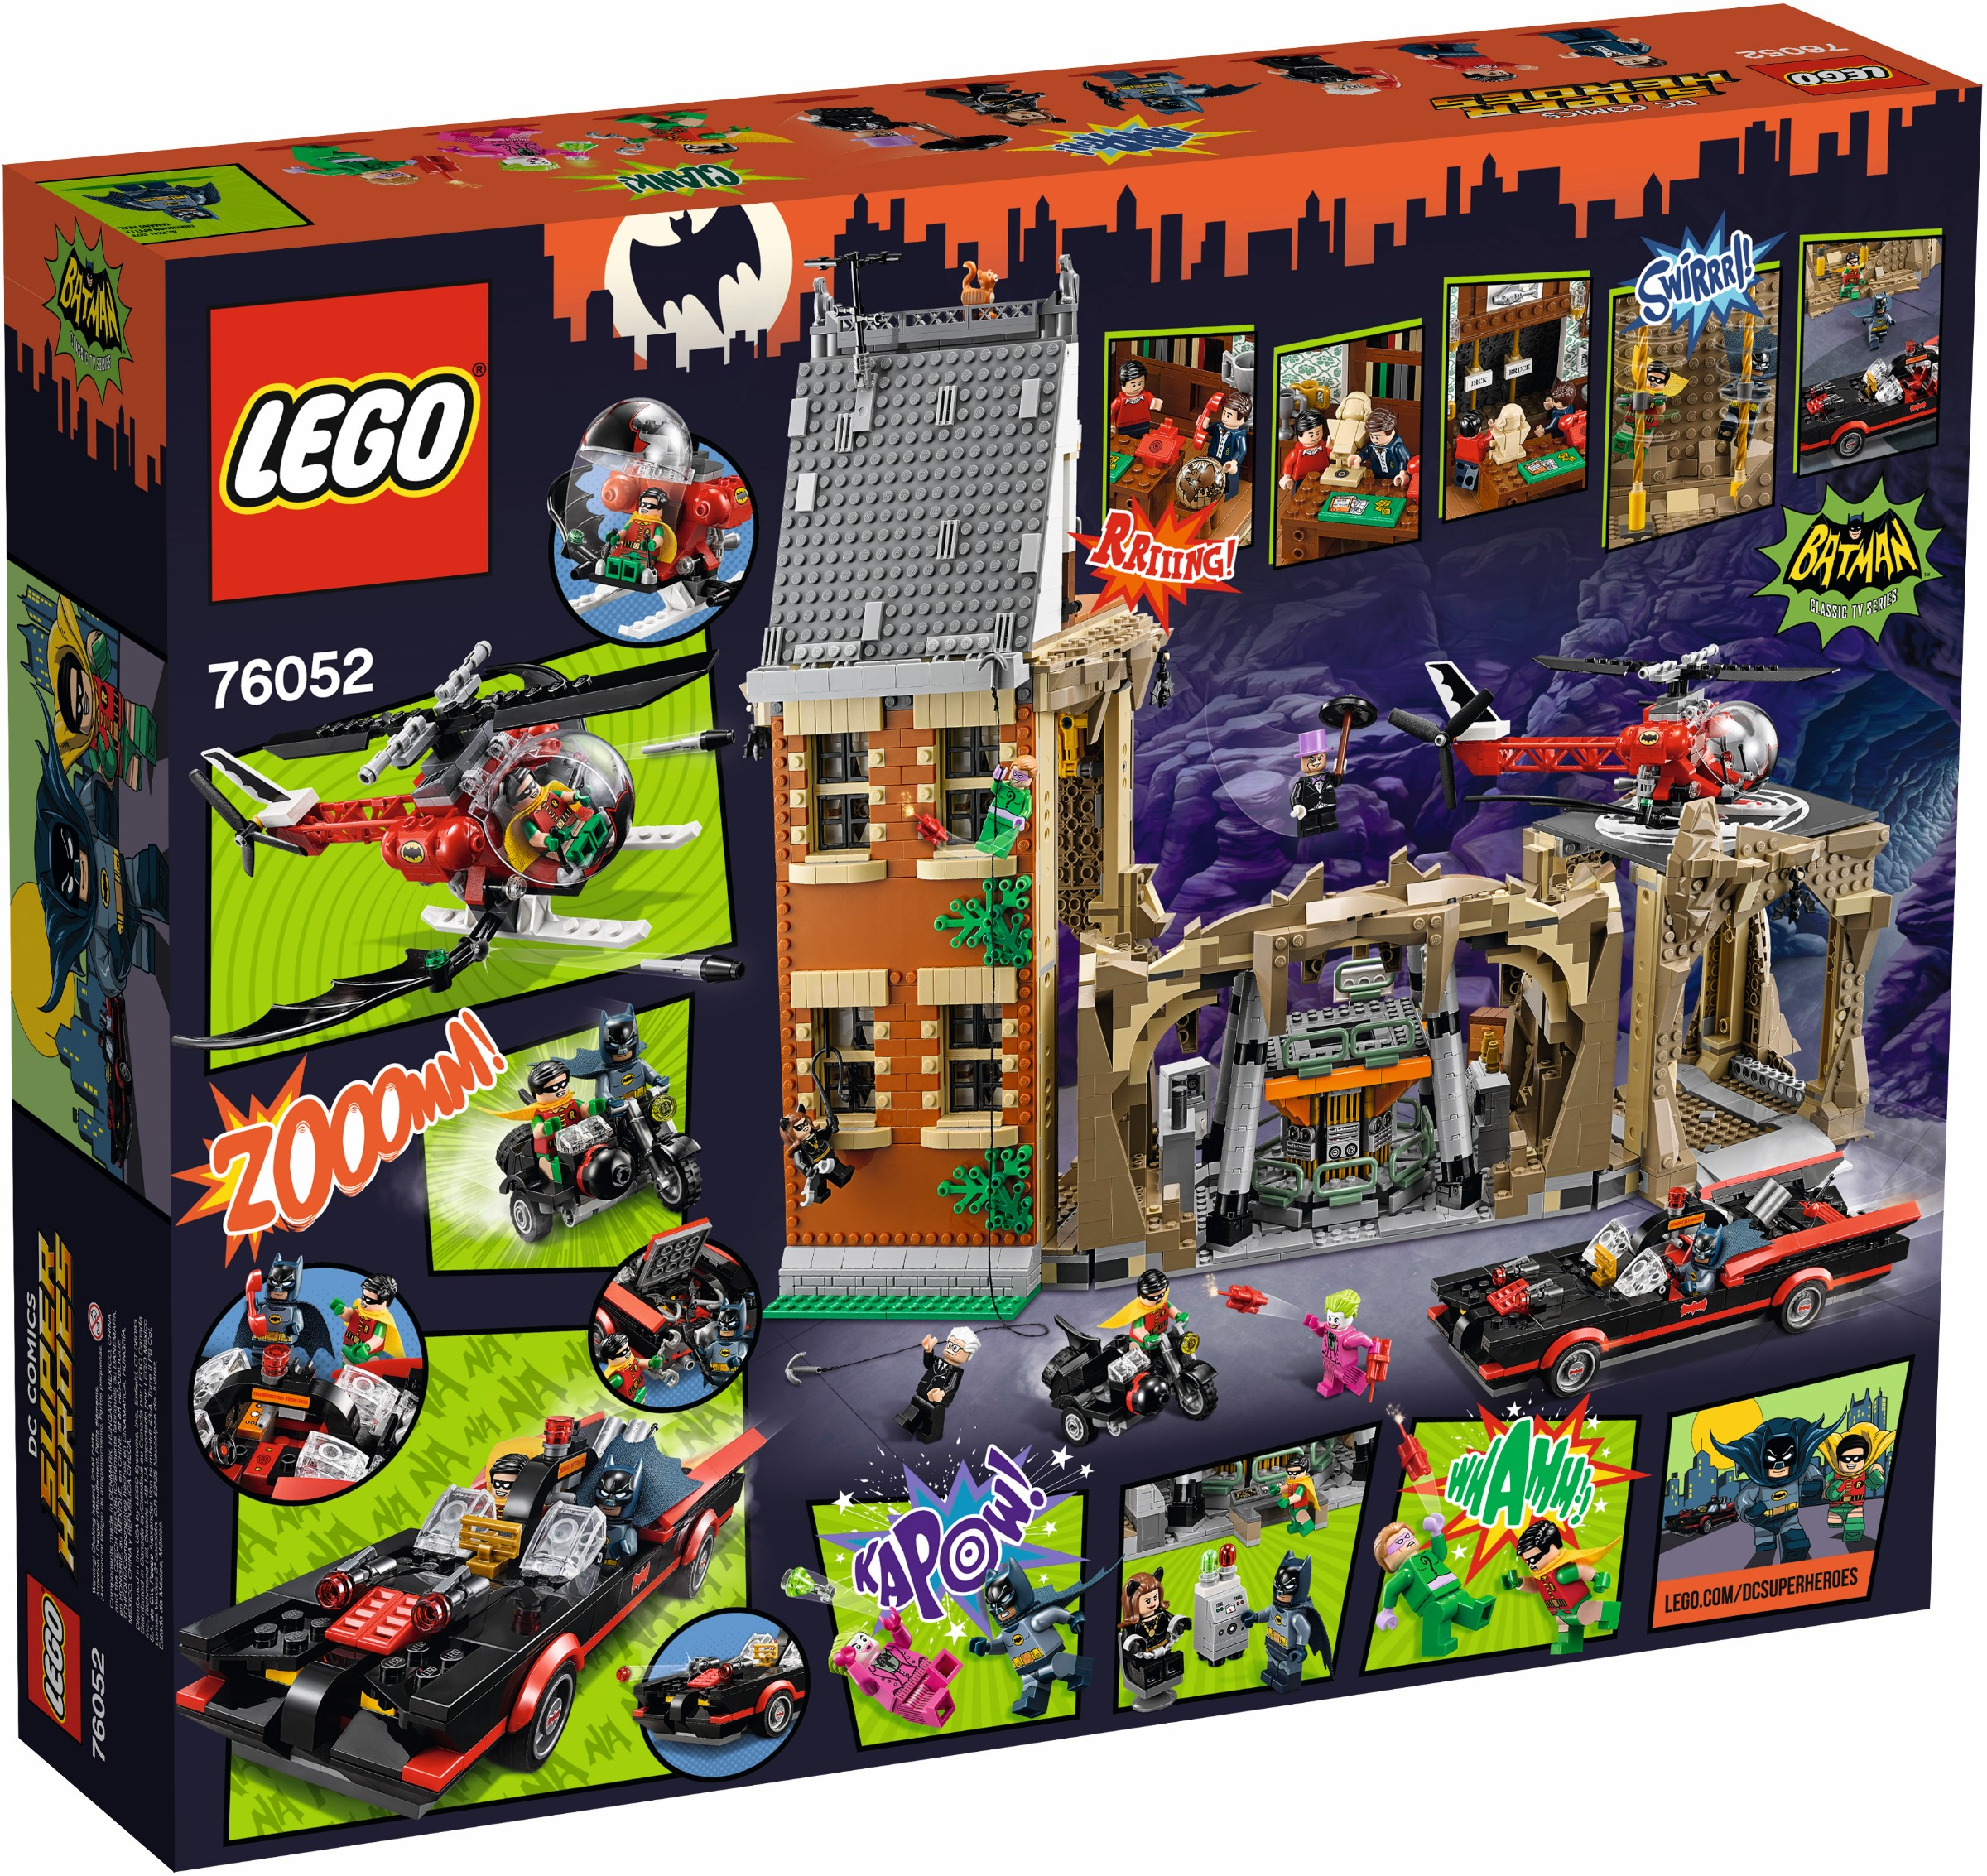 Holy 76052 1 Batman Rebrickable Build With Lego